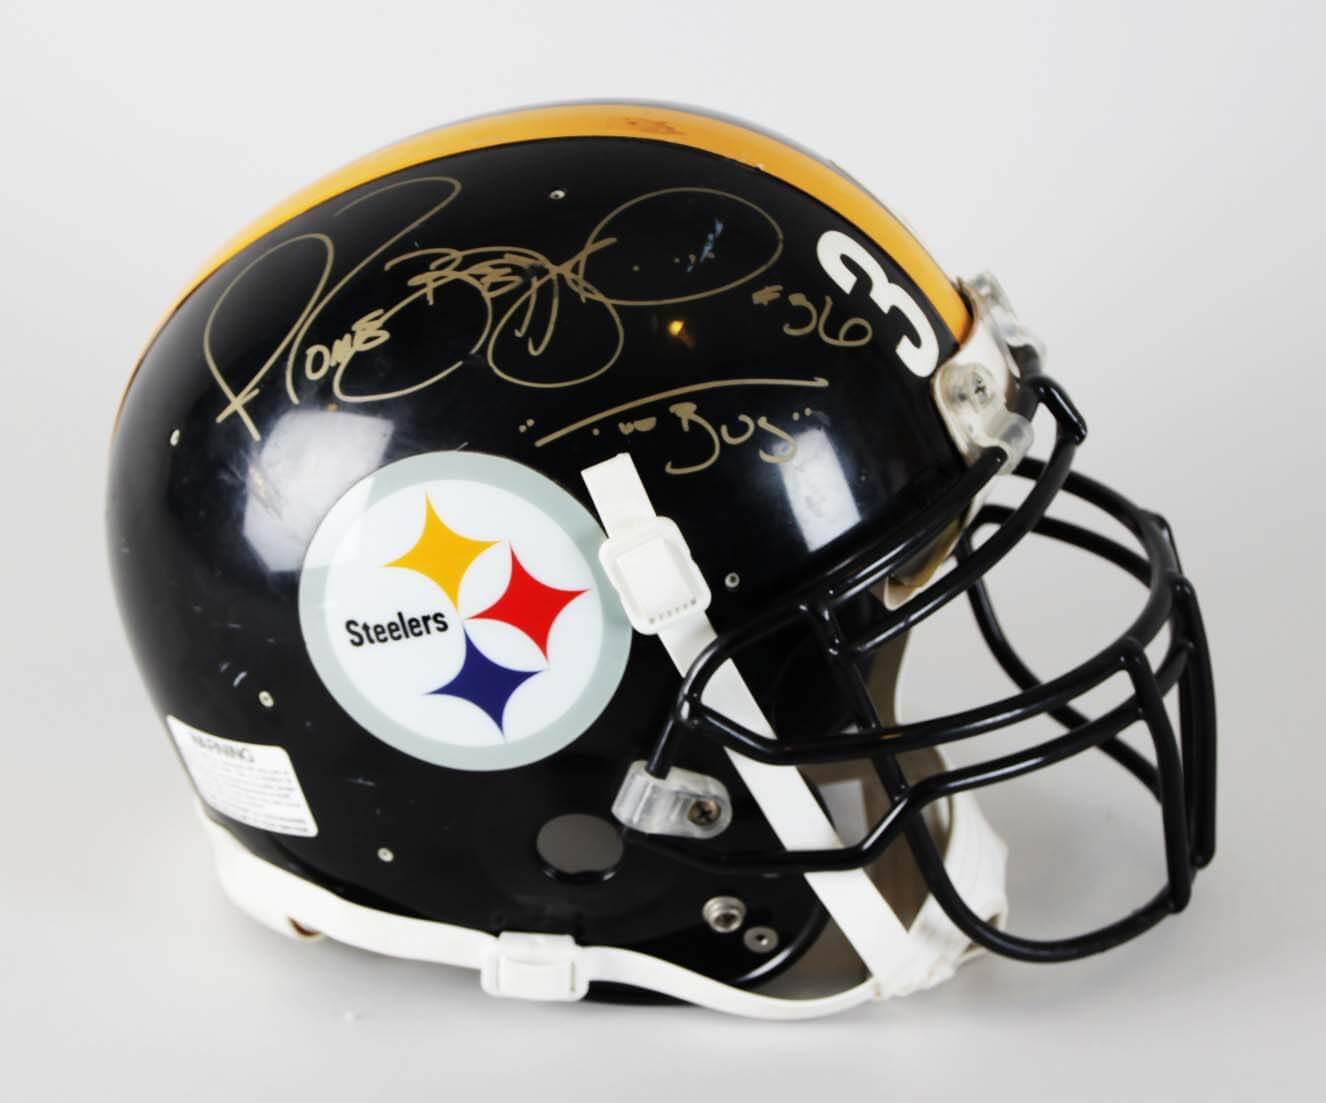 hot sale online ea15f a6510 Jerome Bettis Signed Pittsburgh Steelers Game-Worn Helmet w/Inscriptions -  JSA